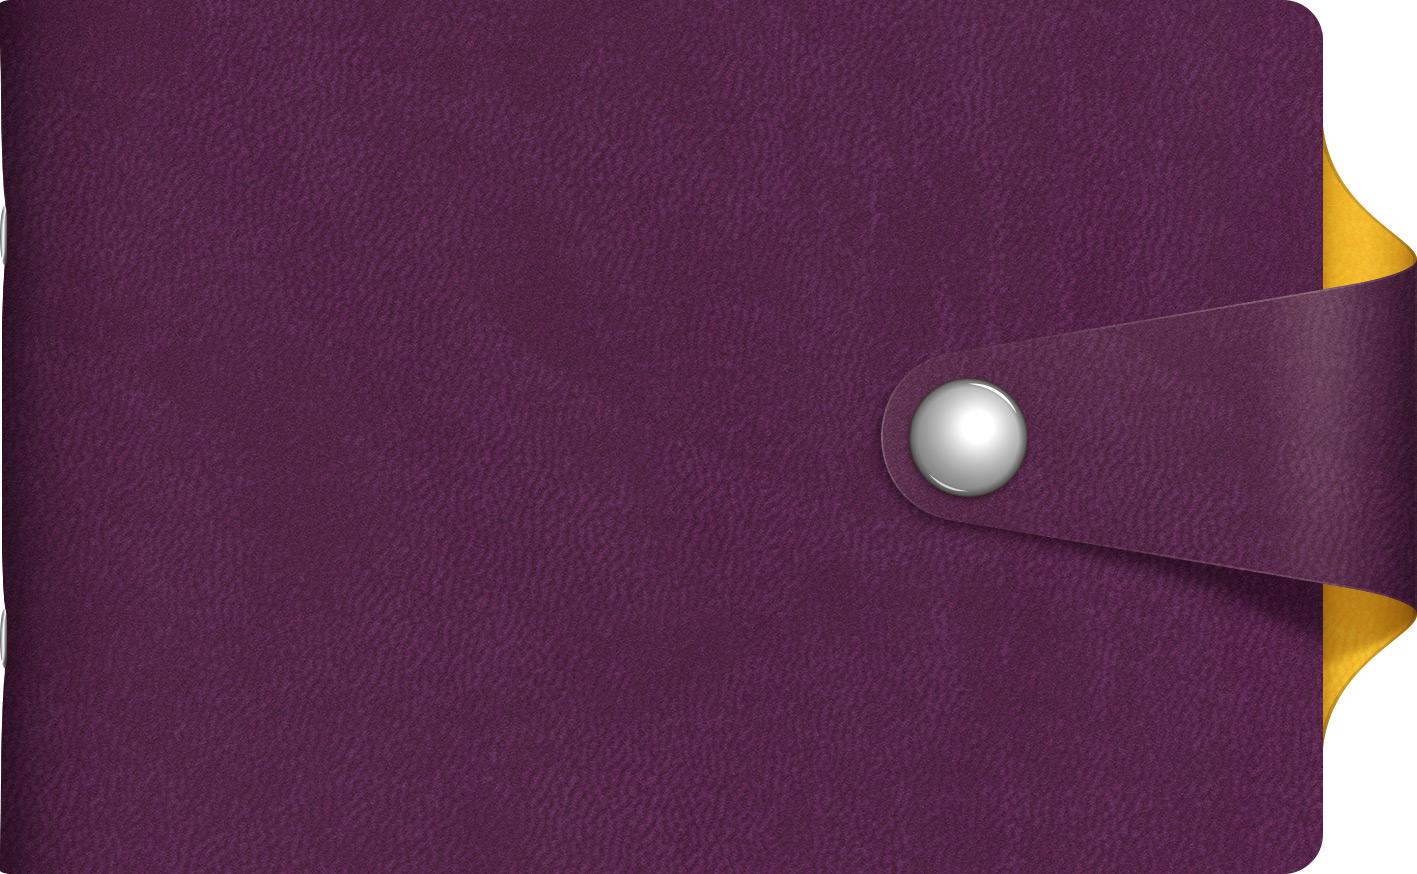 Визитница 12 карманов VIVELLA  BICOLOUR Фиолетовый/желтый хлястик с кн